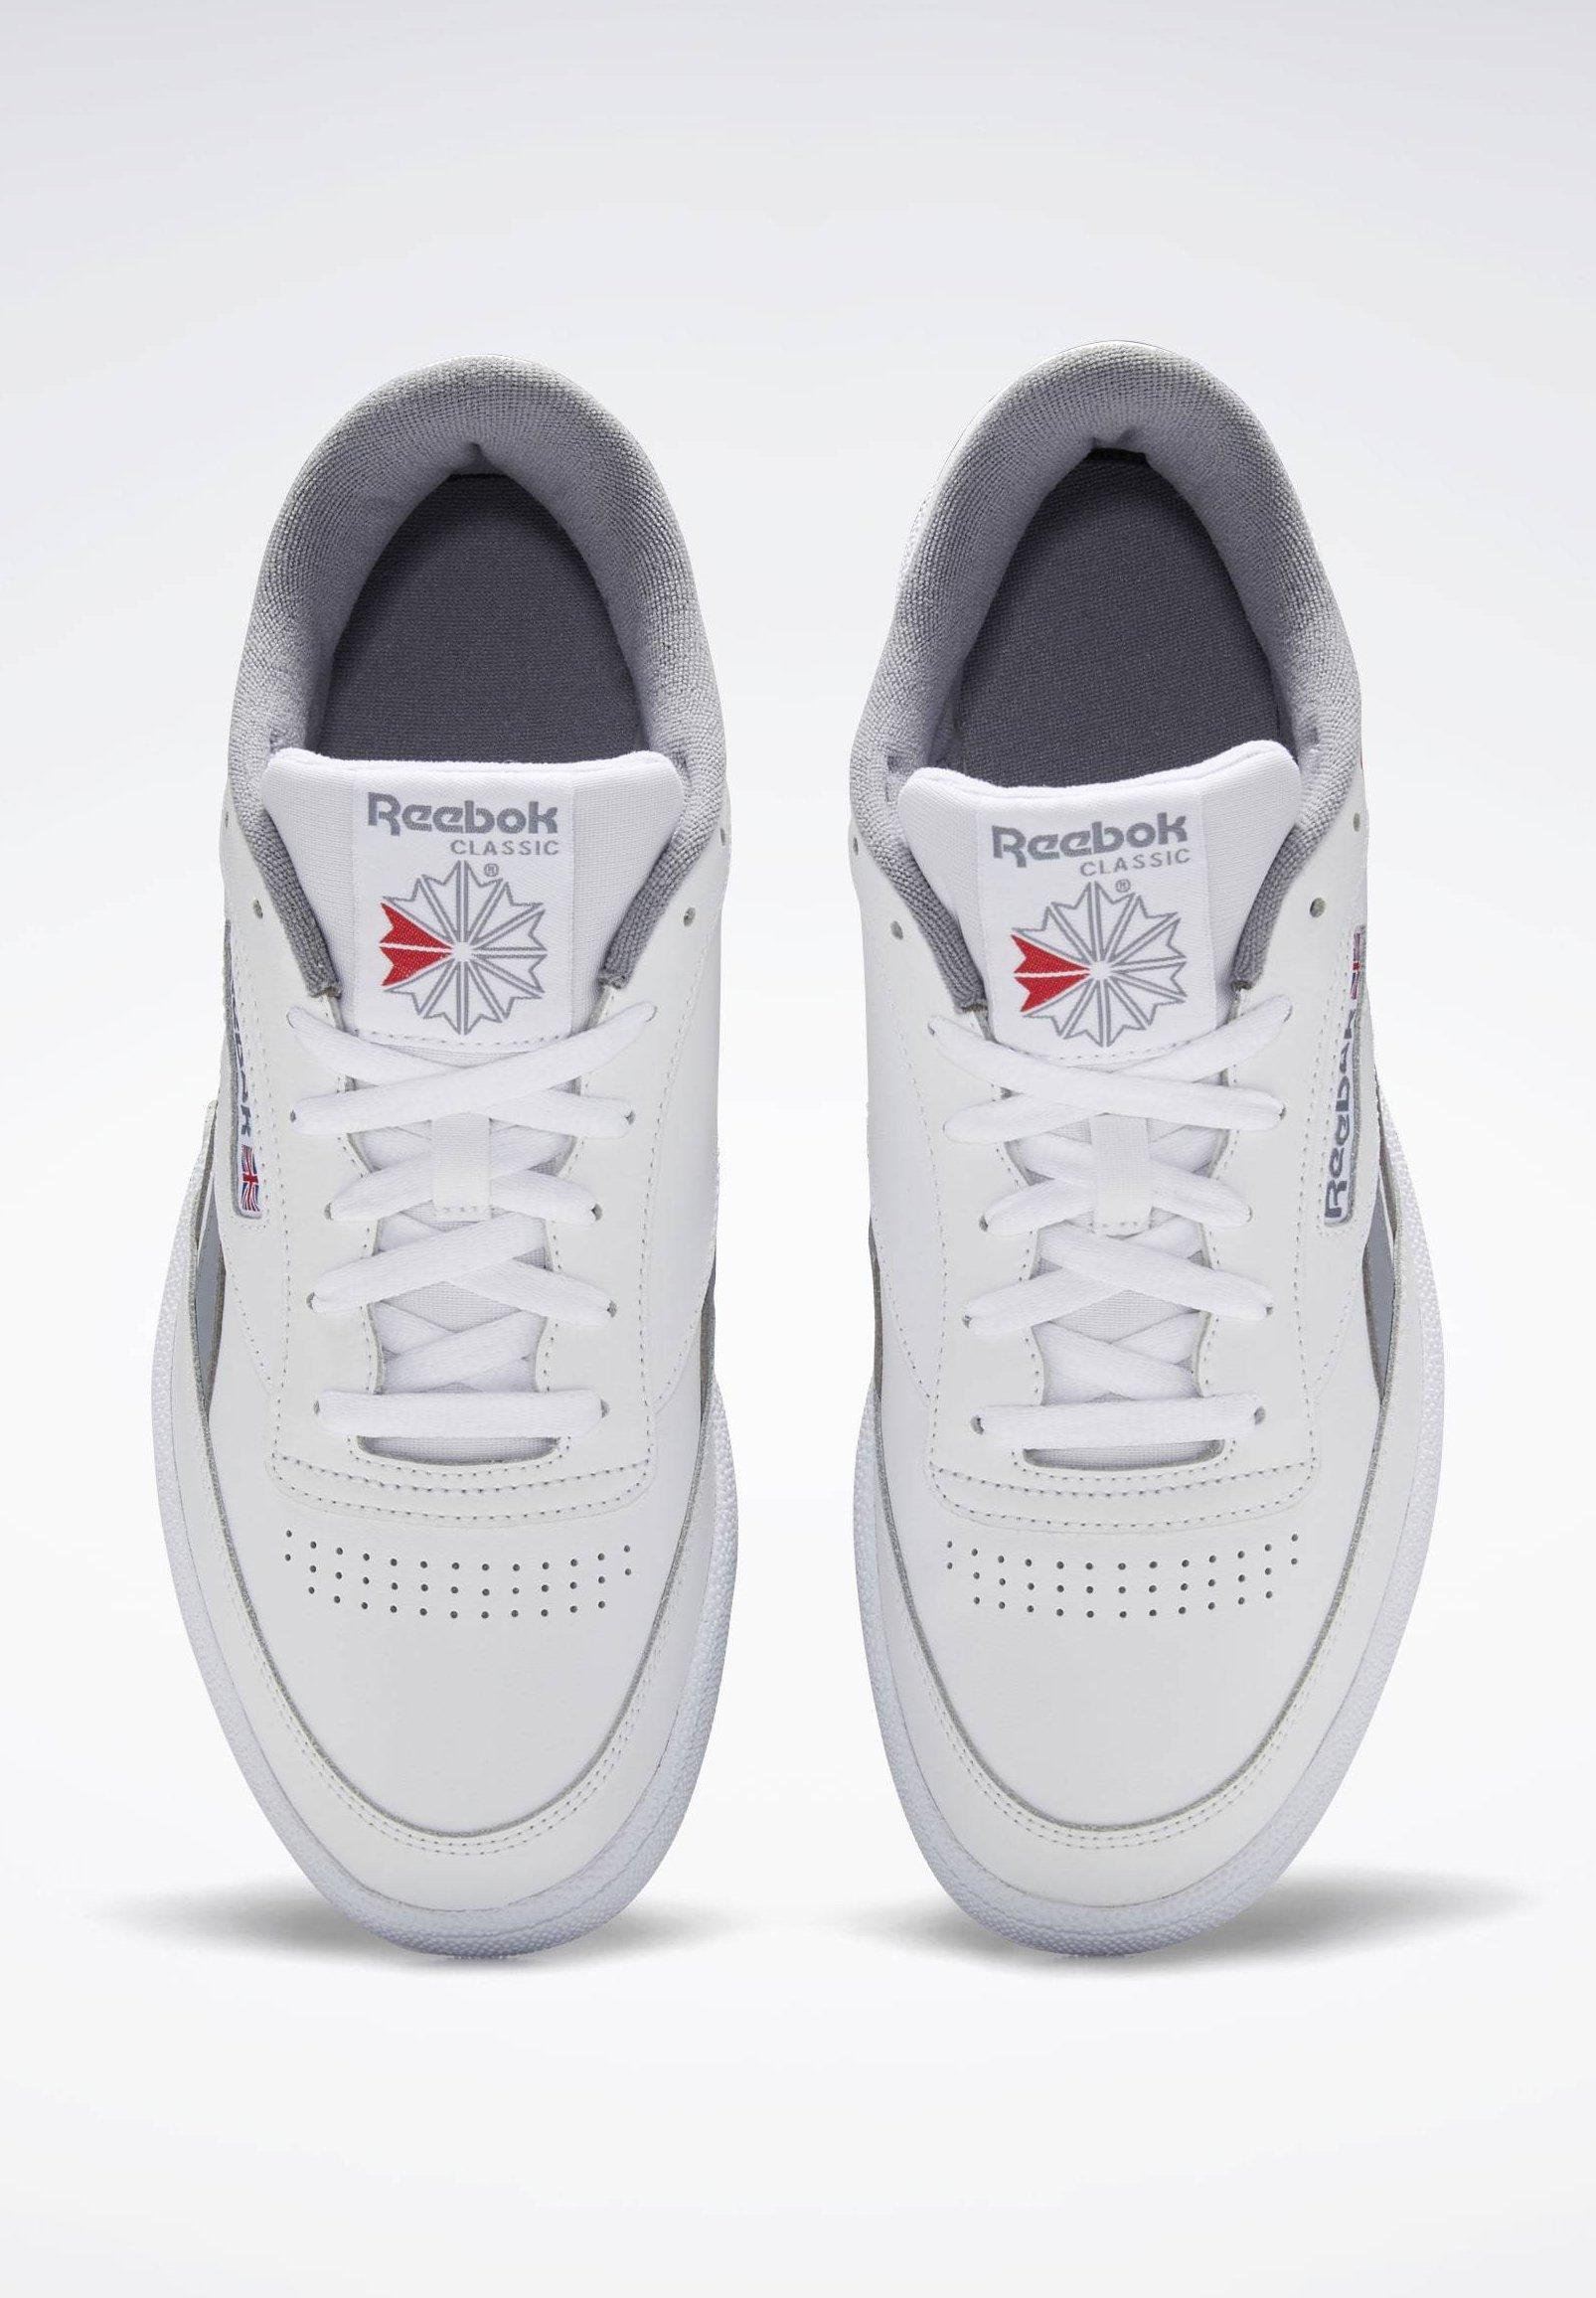 Reebok Classic Club C Revenge Shoes - Baskets Basses White QlMwS2A